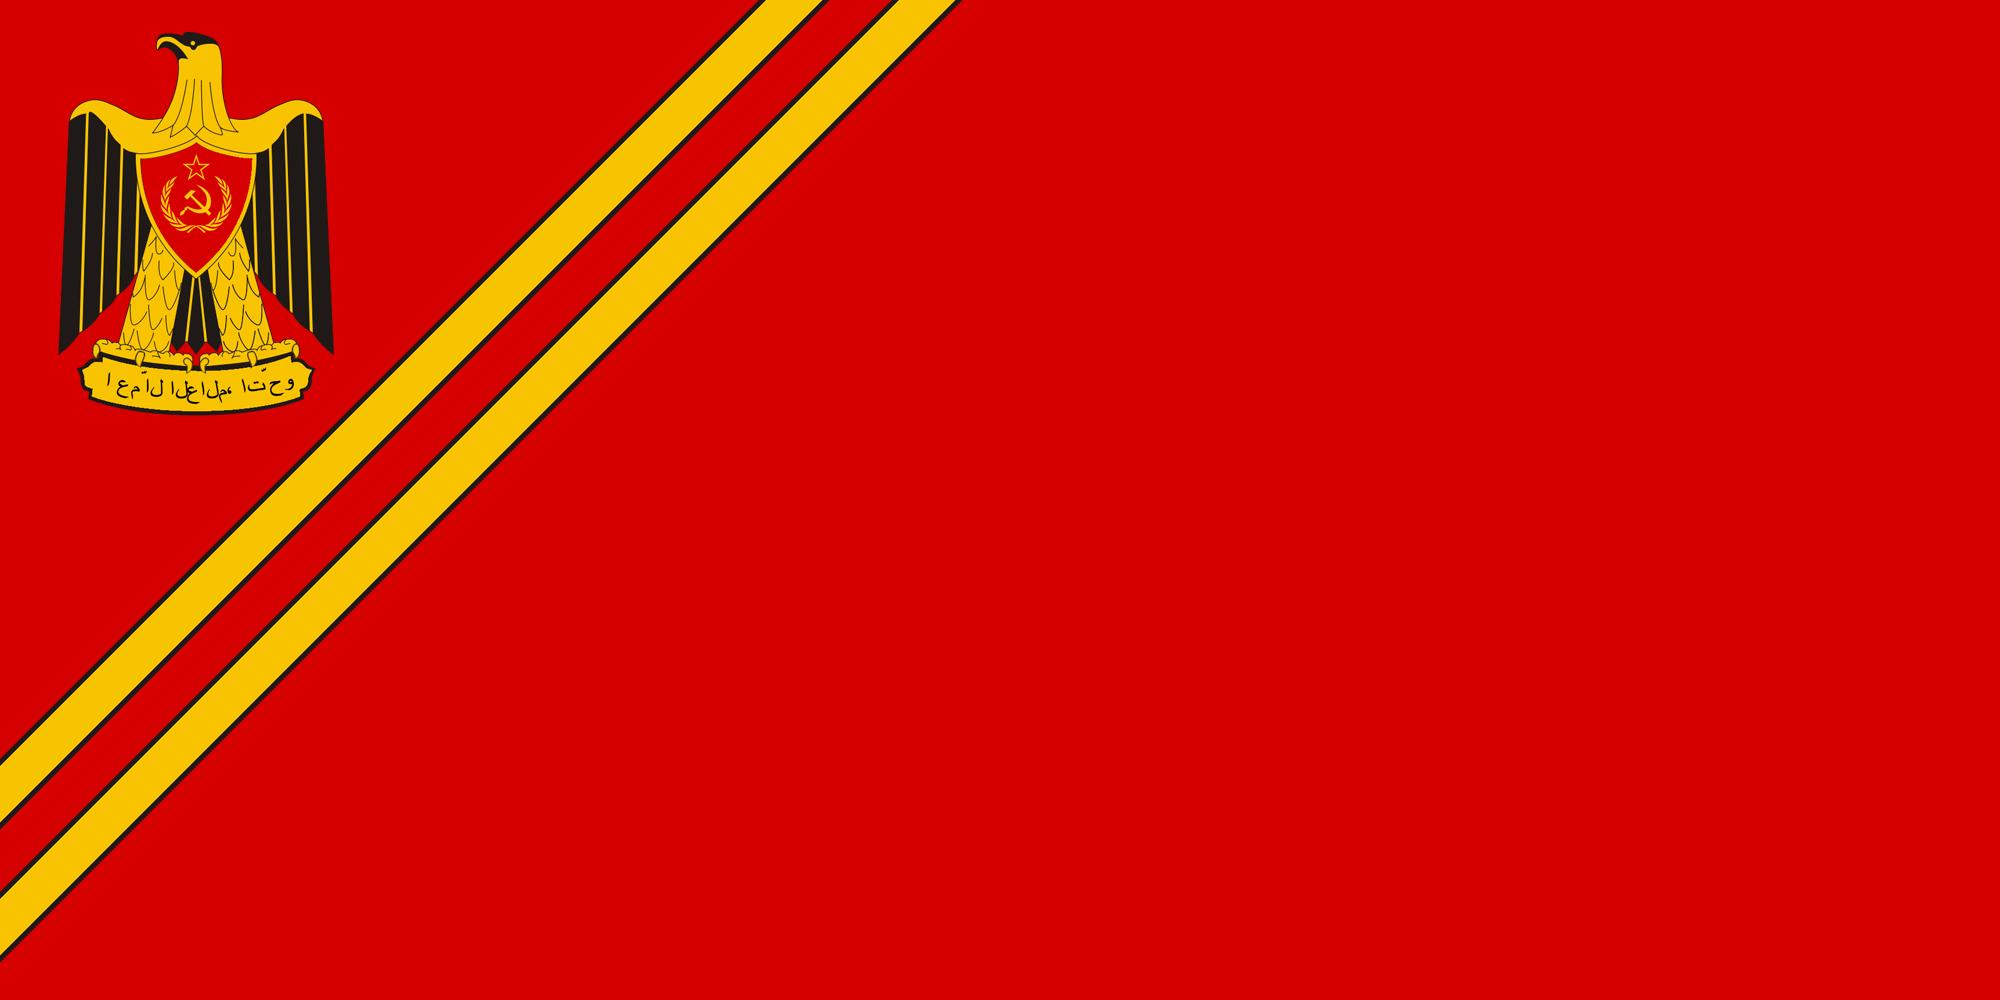 The Flag of the al-Jumhuriat al-Aishtirakiat al-Thawriat al-Mutahida al-Badara (Revolutionary Federated Socialist Republic of Badara)